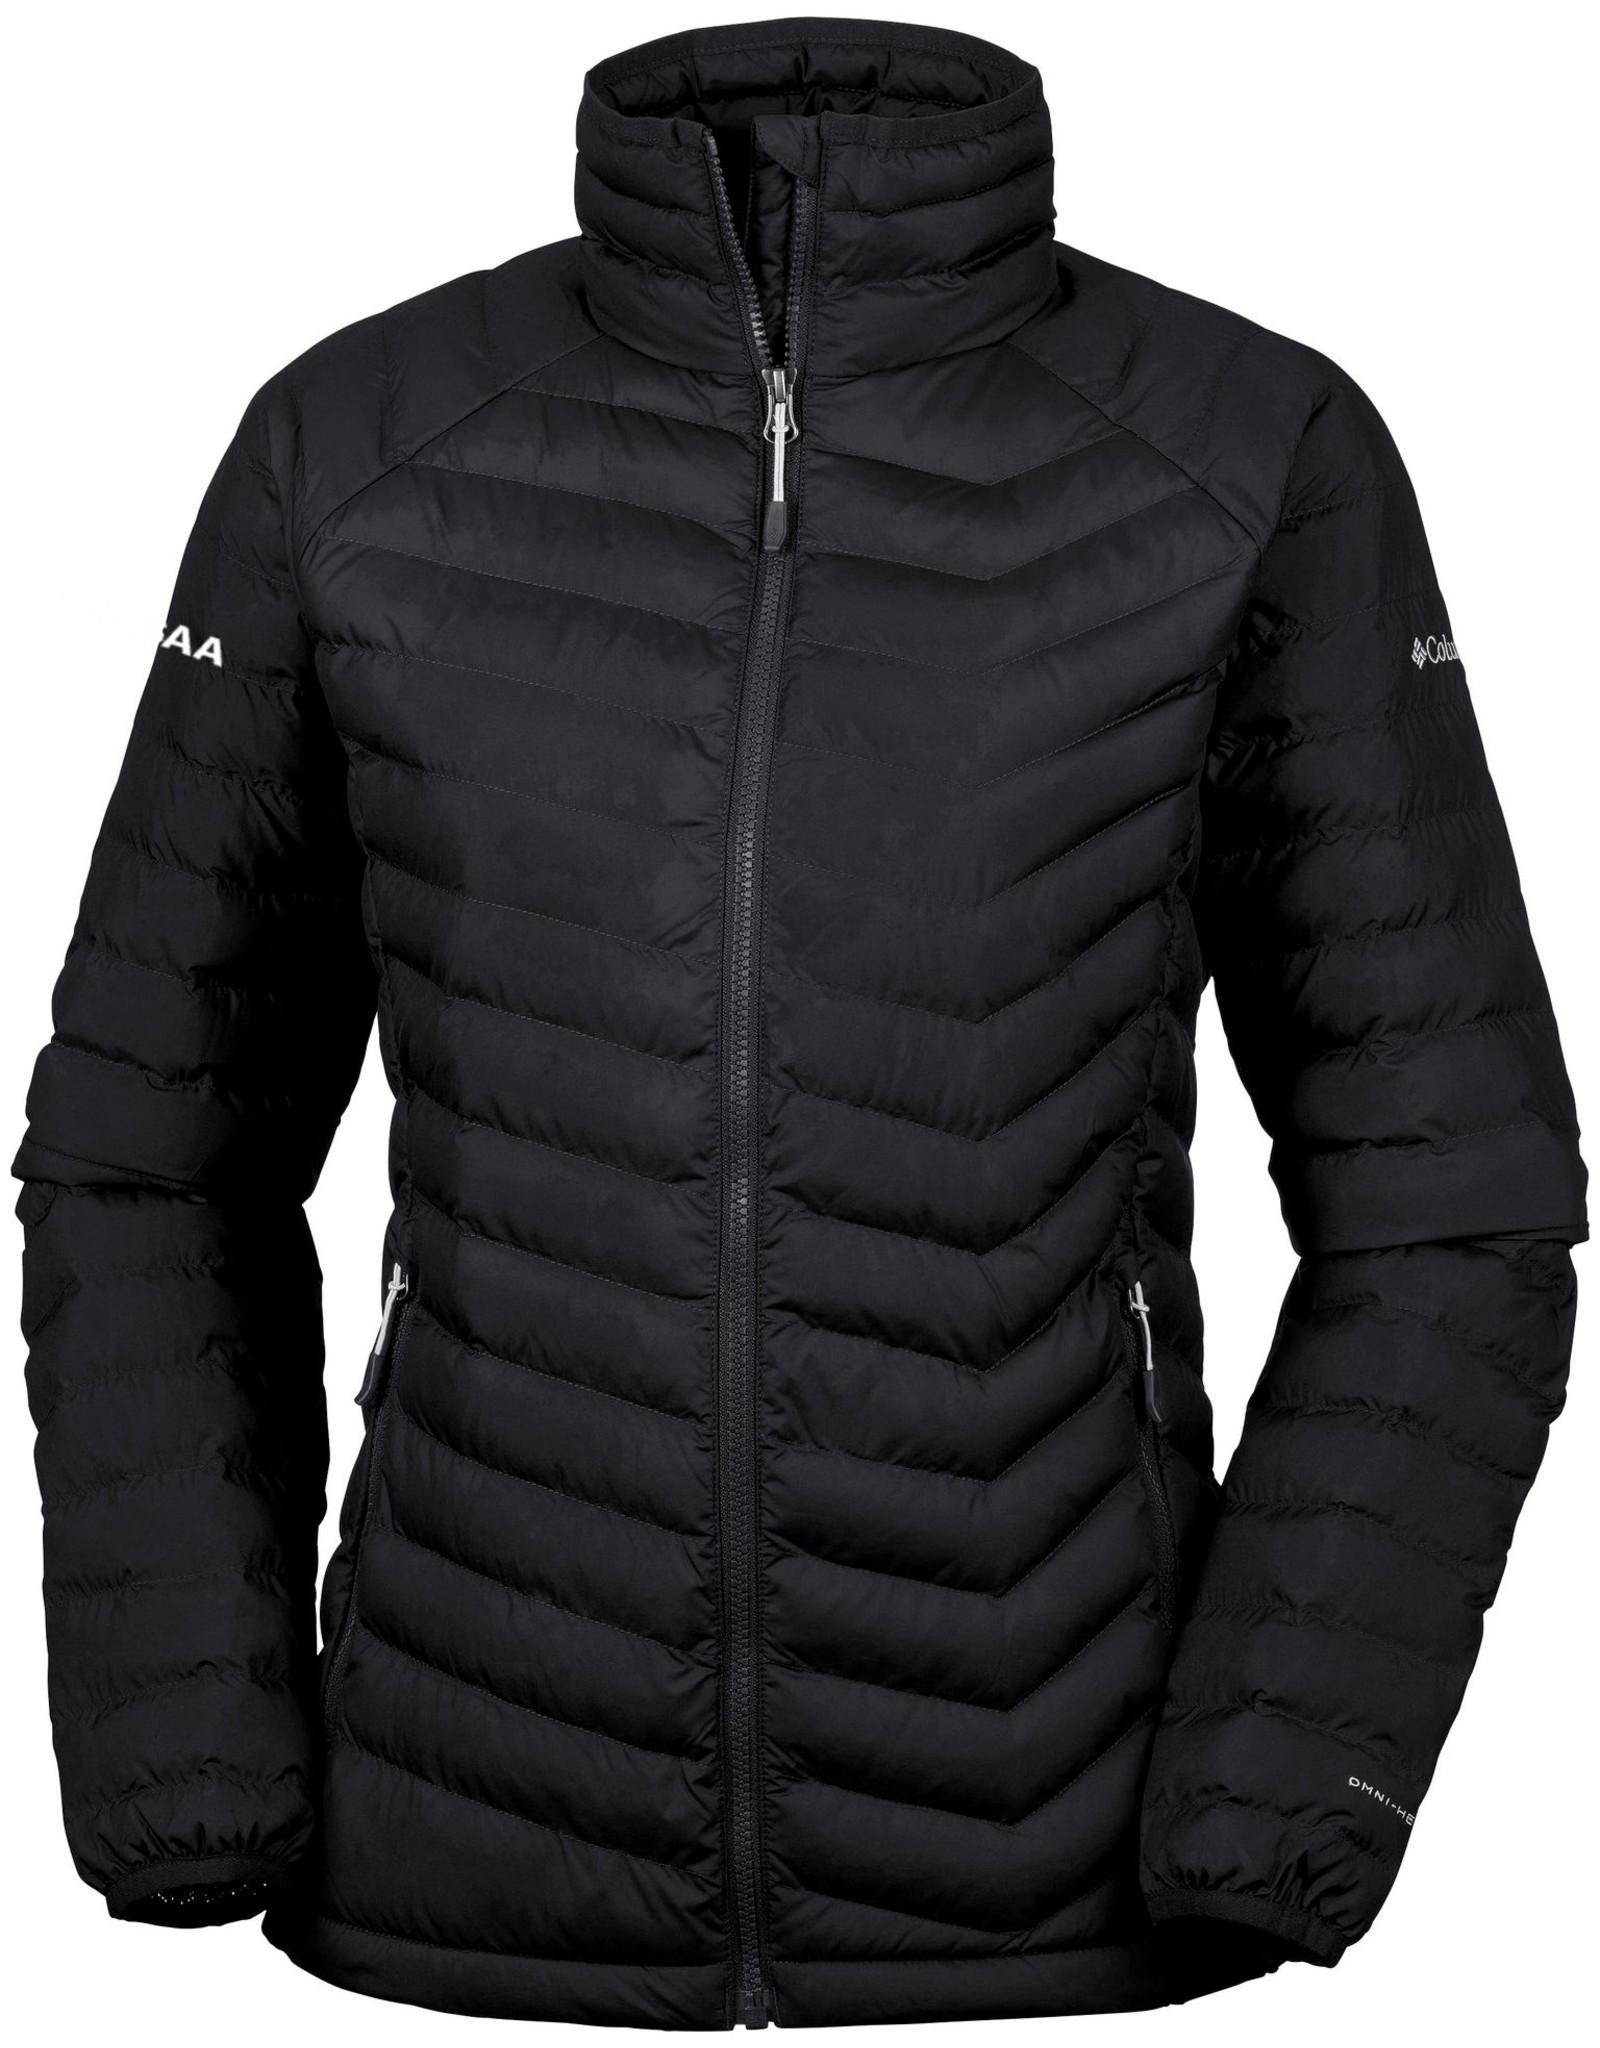 Columbia LADIES Powder Lite Jacket